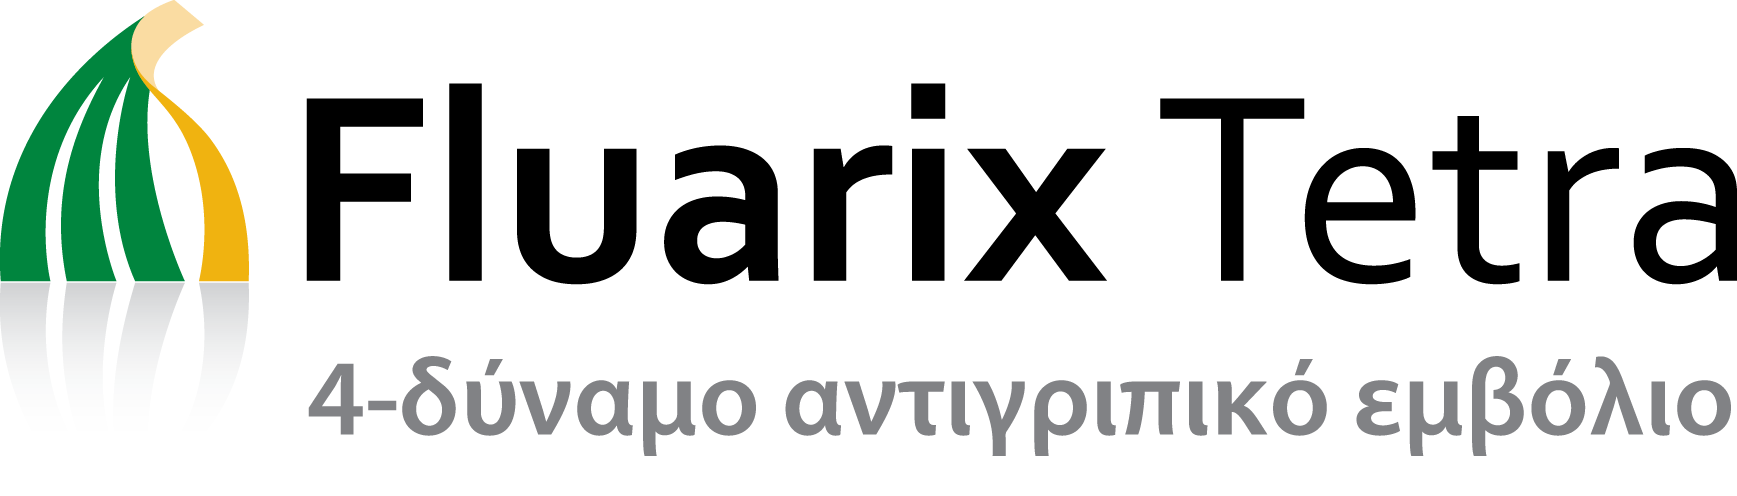 FluarixTetra Logo with Tagline